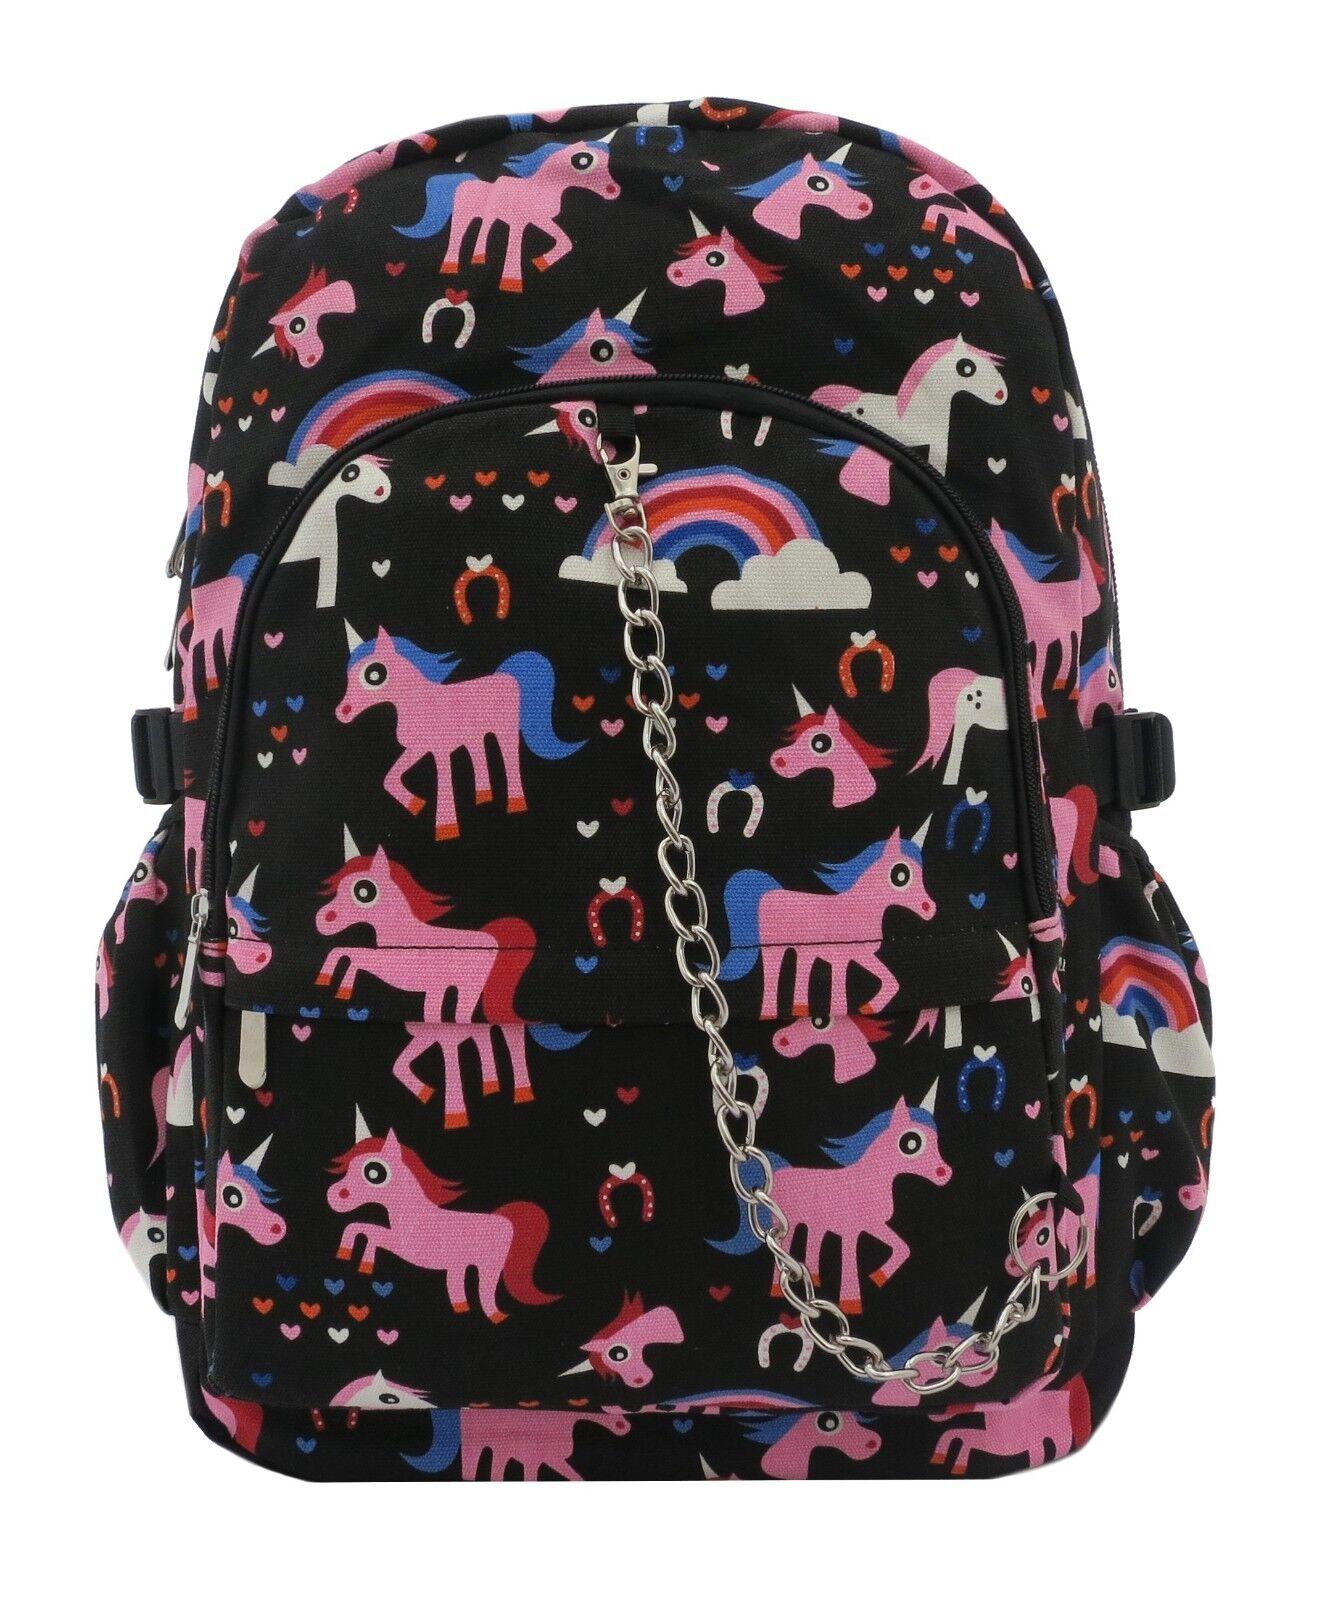 UNICORN Backpack Rucksack Cool Cute School Festival Rainbow Goth Emo Travel Bag